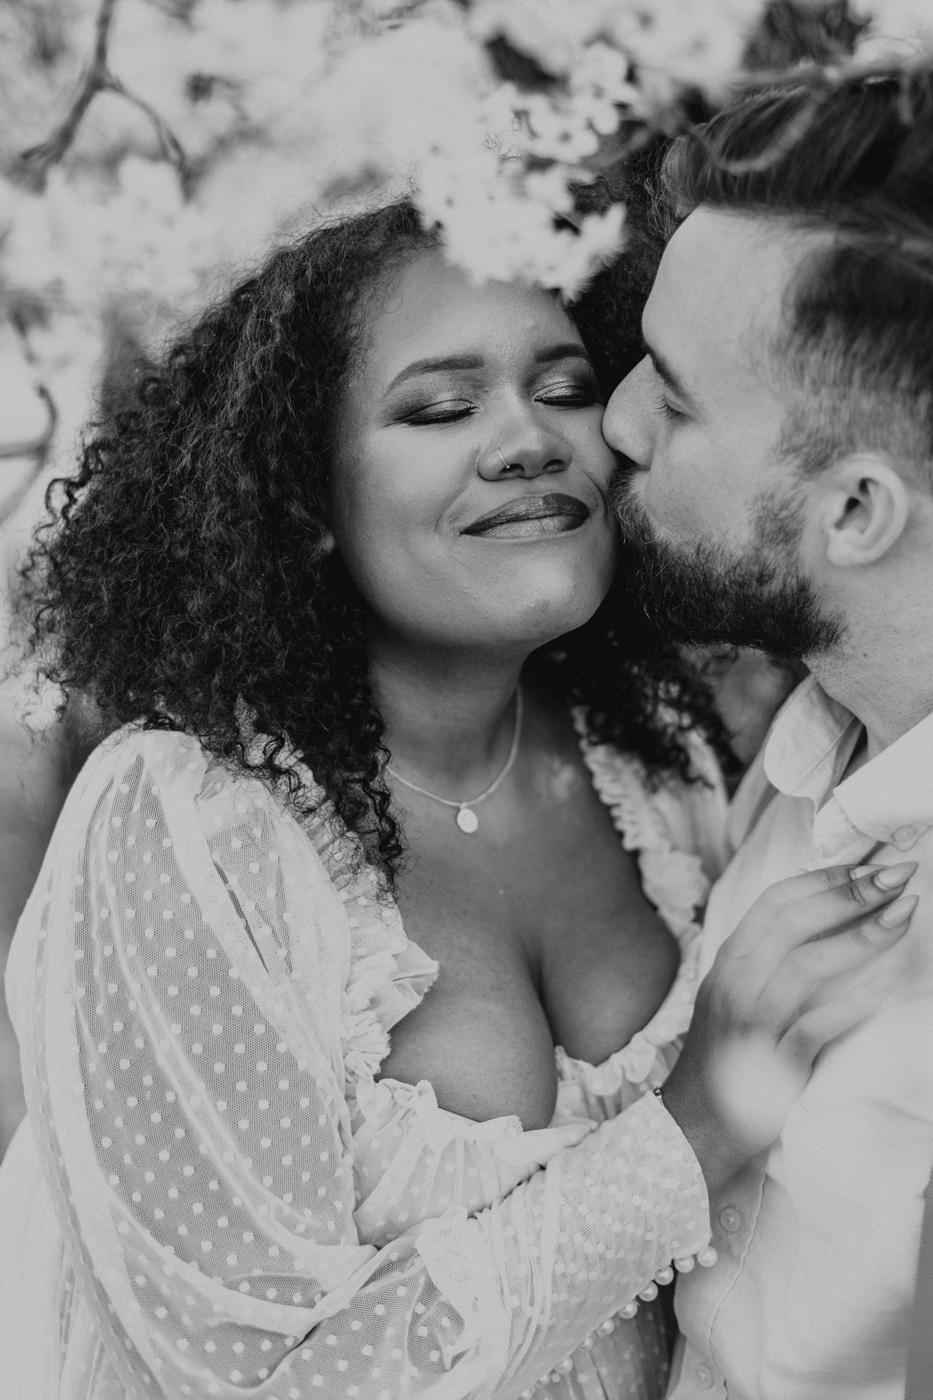 groom kisses bride's cheek during elopement portraits in Georgia